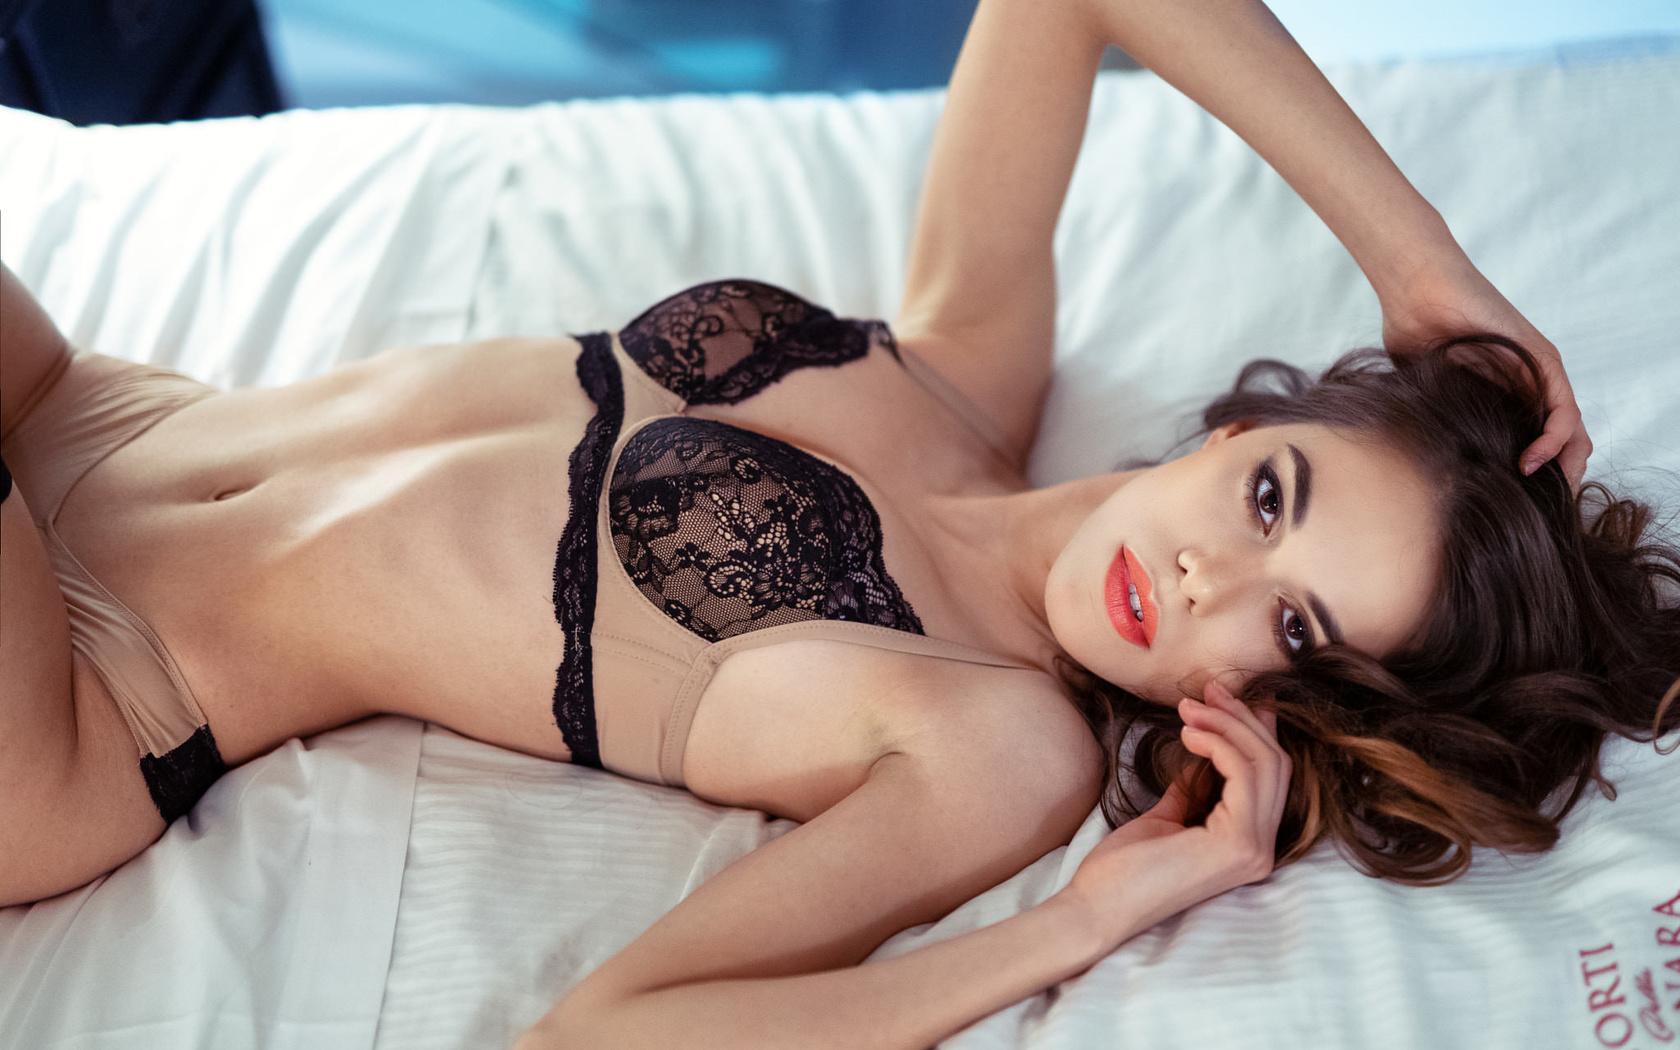 women, marco squassina, in bed, brunette, belly, lingerie, lying on back